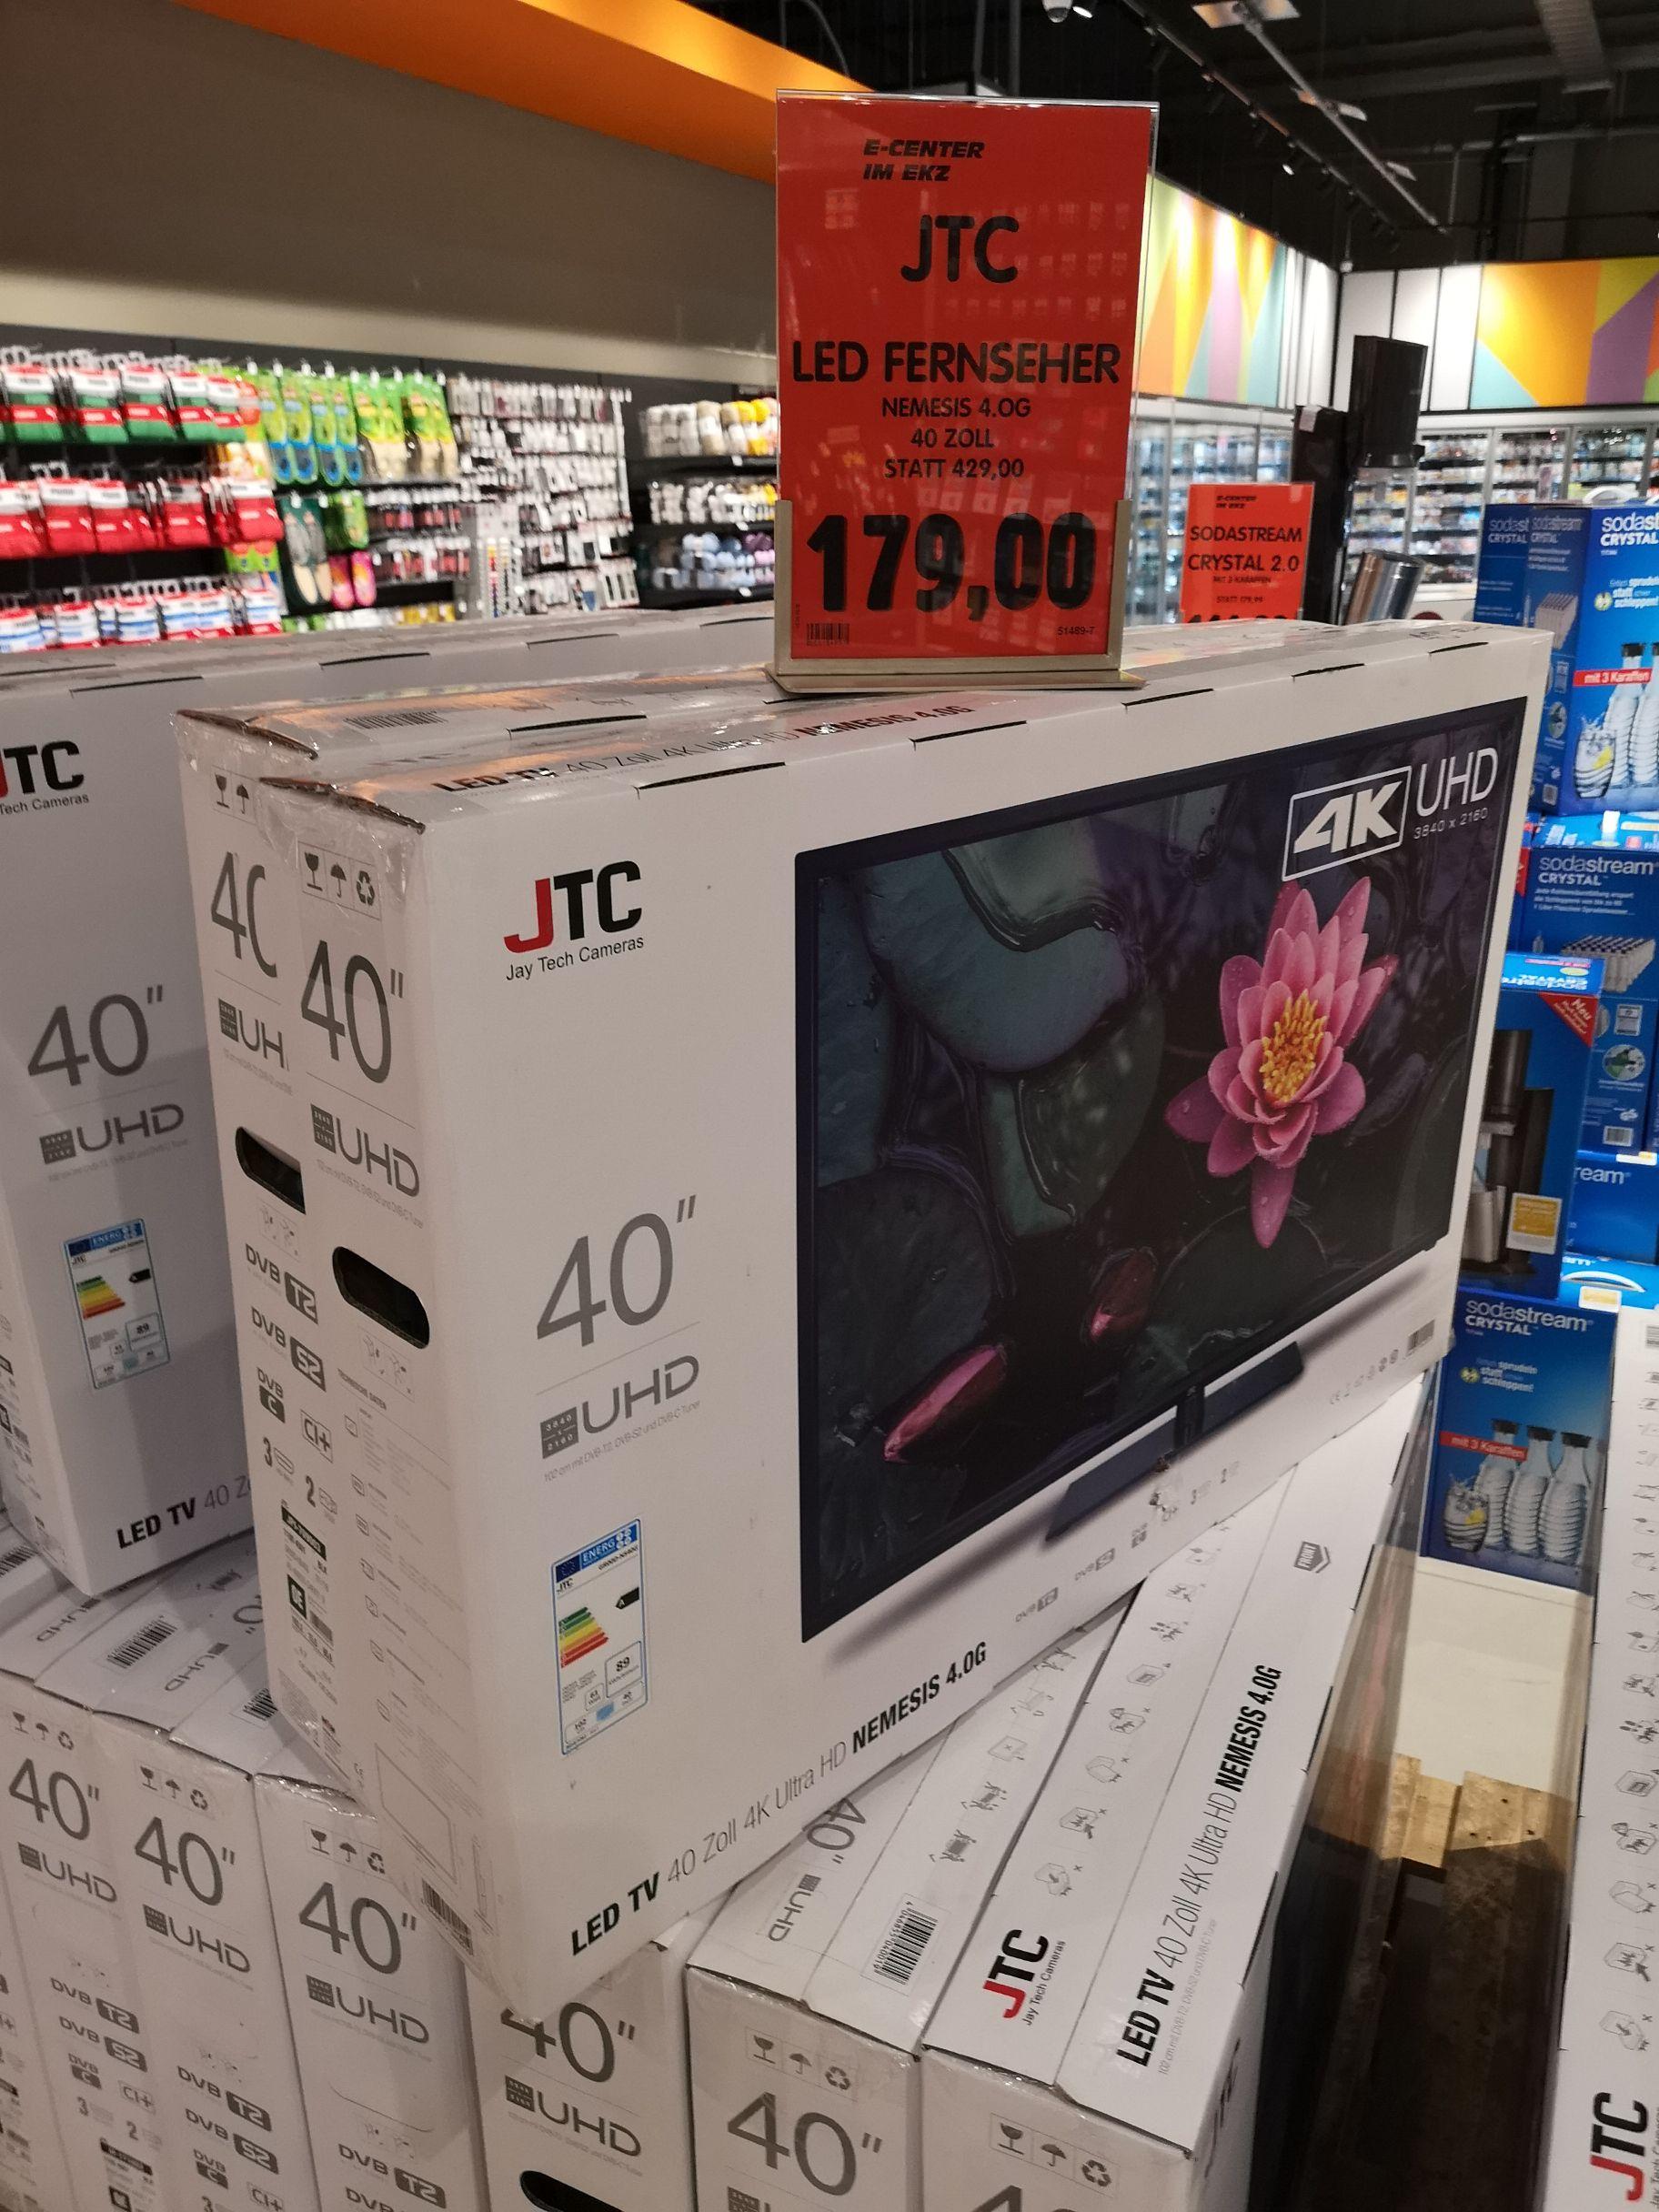 [Lokal Krefeld] JTC 40 Zoll UHD TV NEMESIS 4.0G